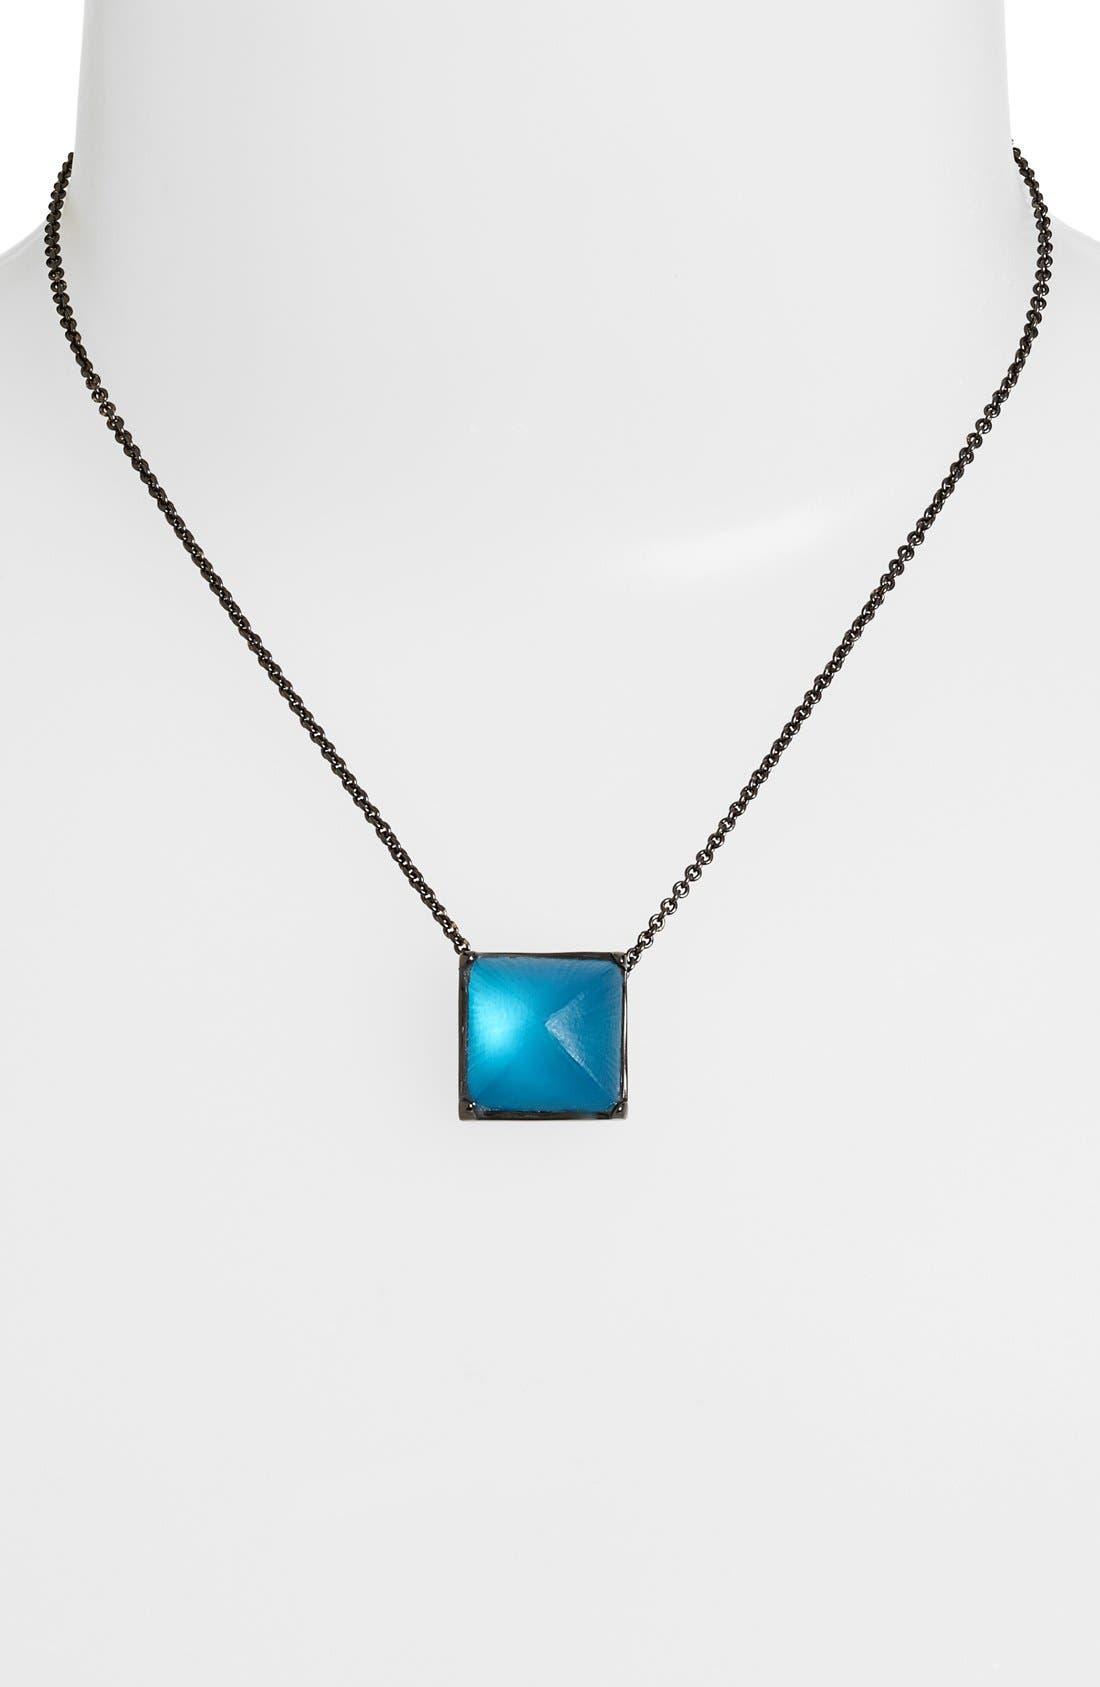 Main Image - Alexis Bittar 'Lucite® - Santa Fe Deco' Pyramid Pendant Necklace